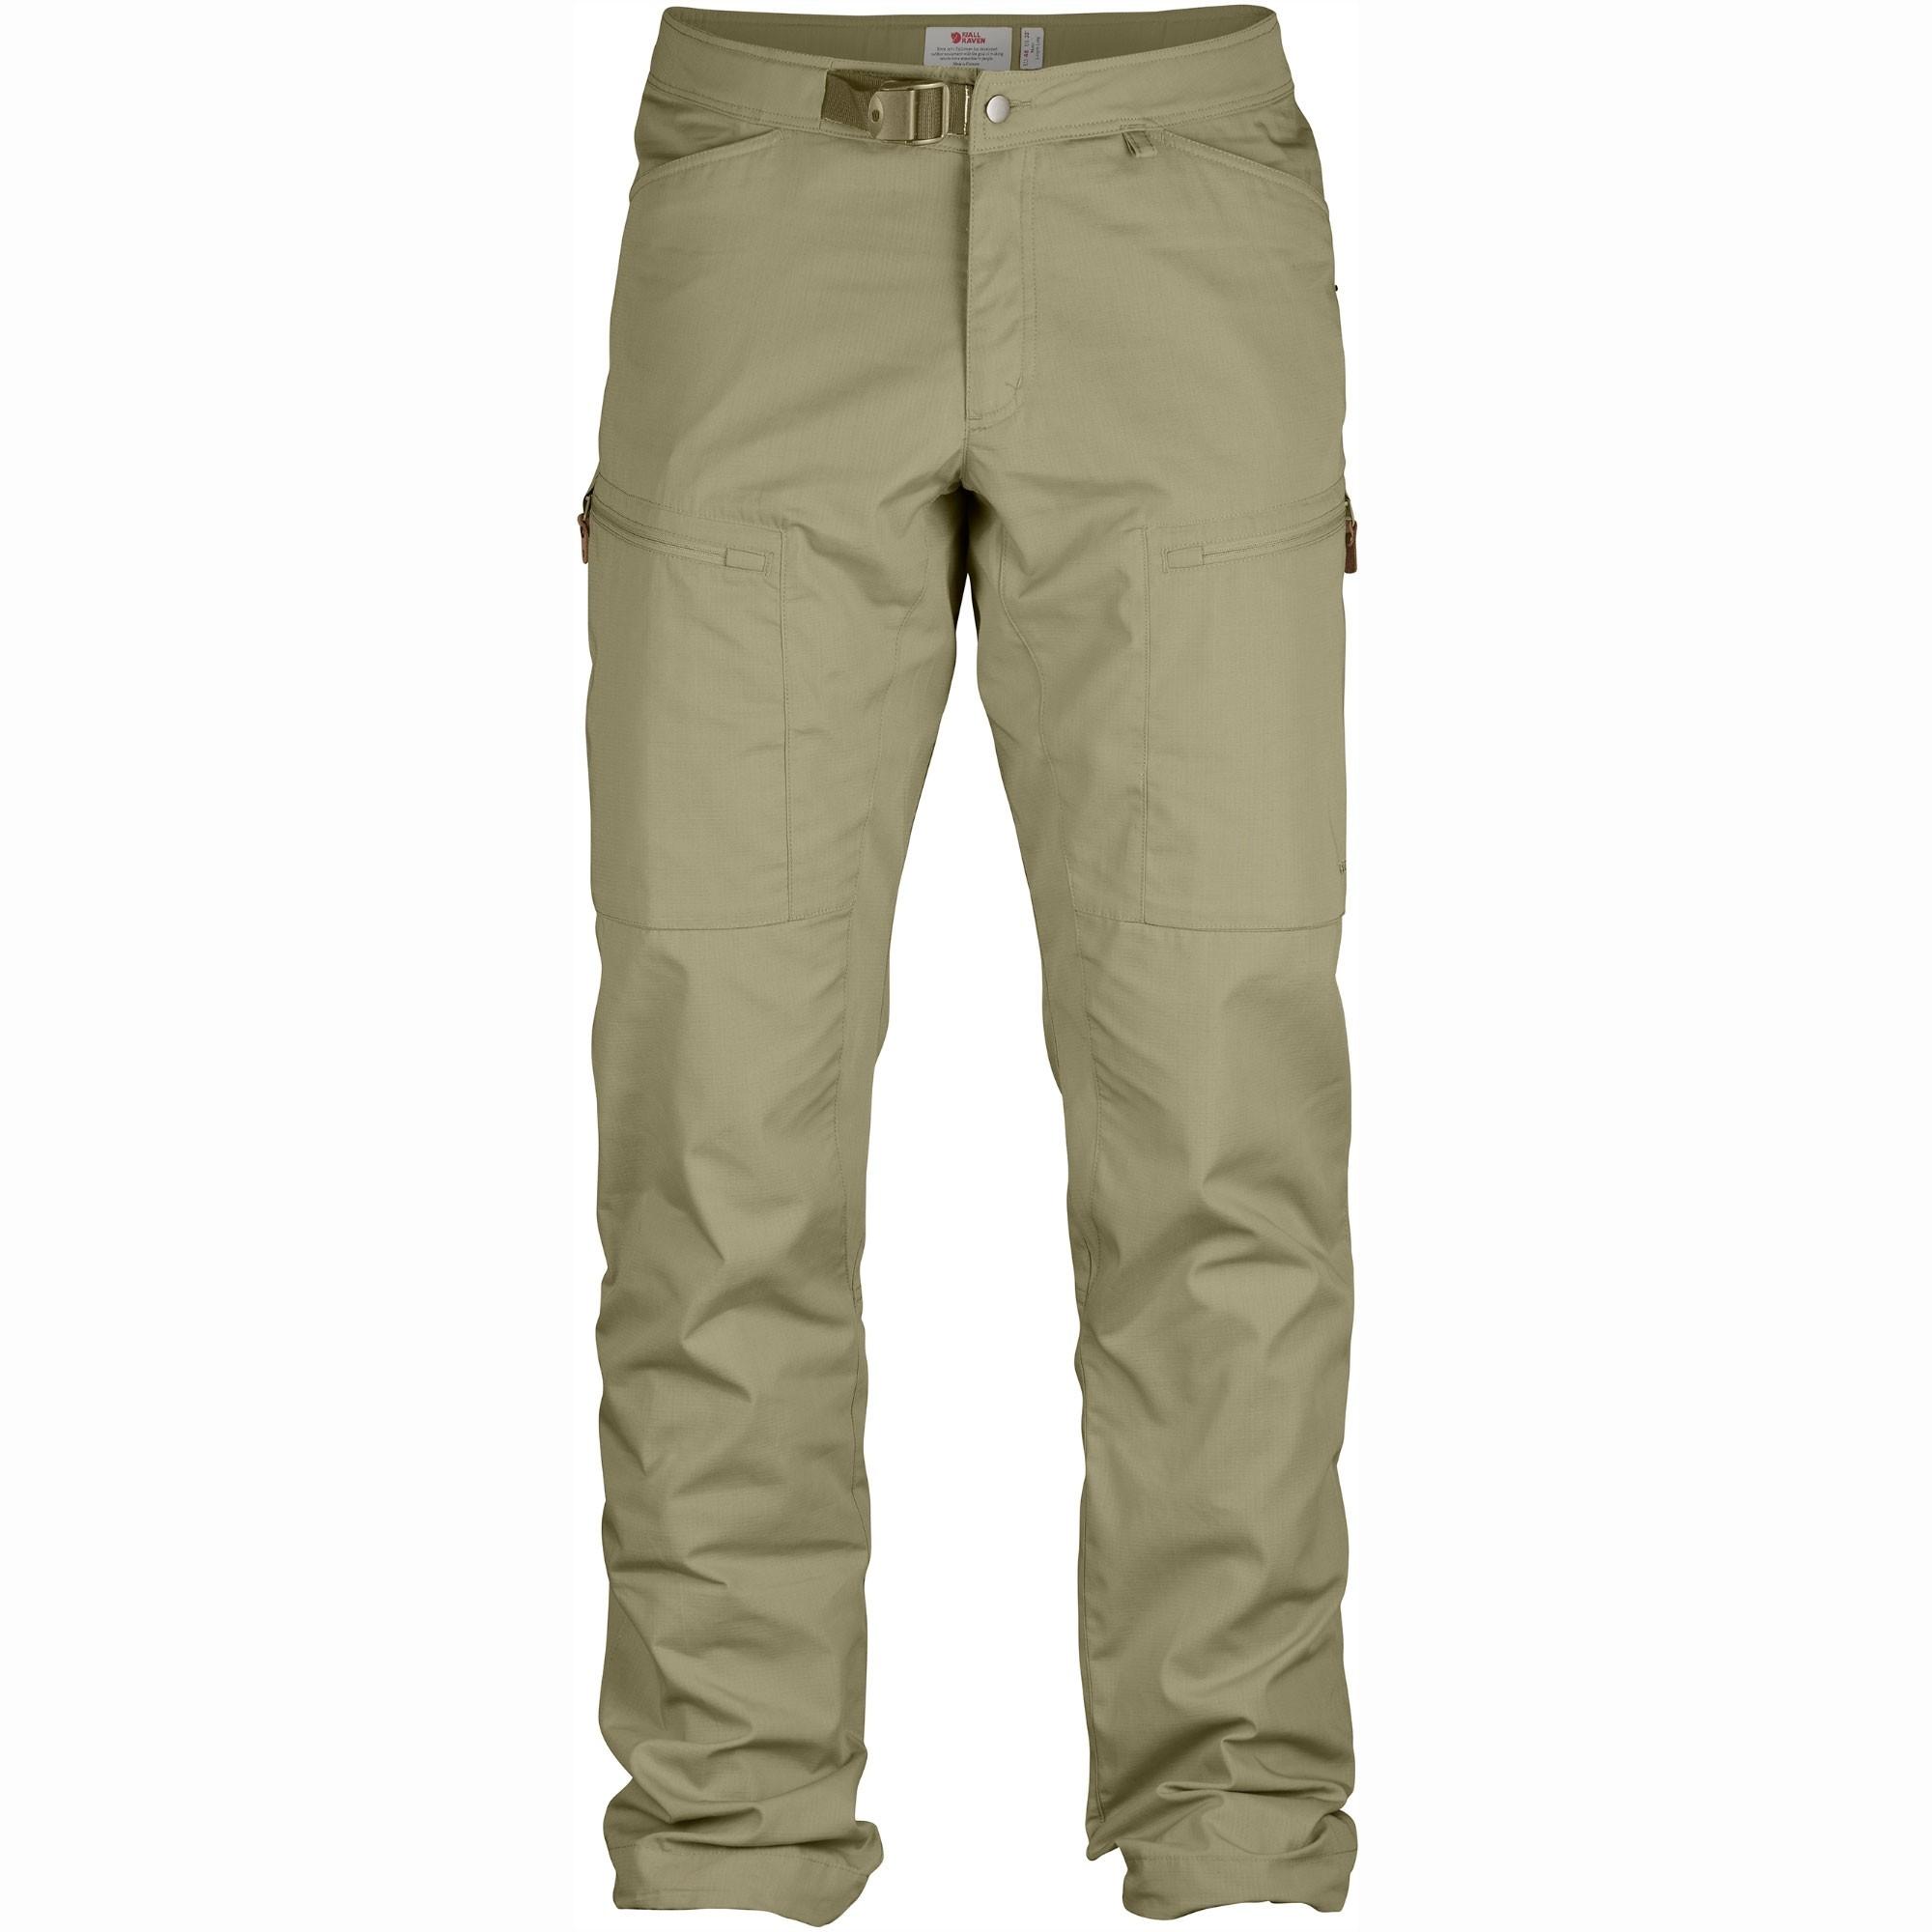 Fjallraven Abisko Shade Men's Trousers 81534 - Savanna